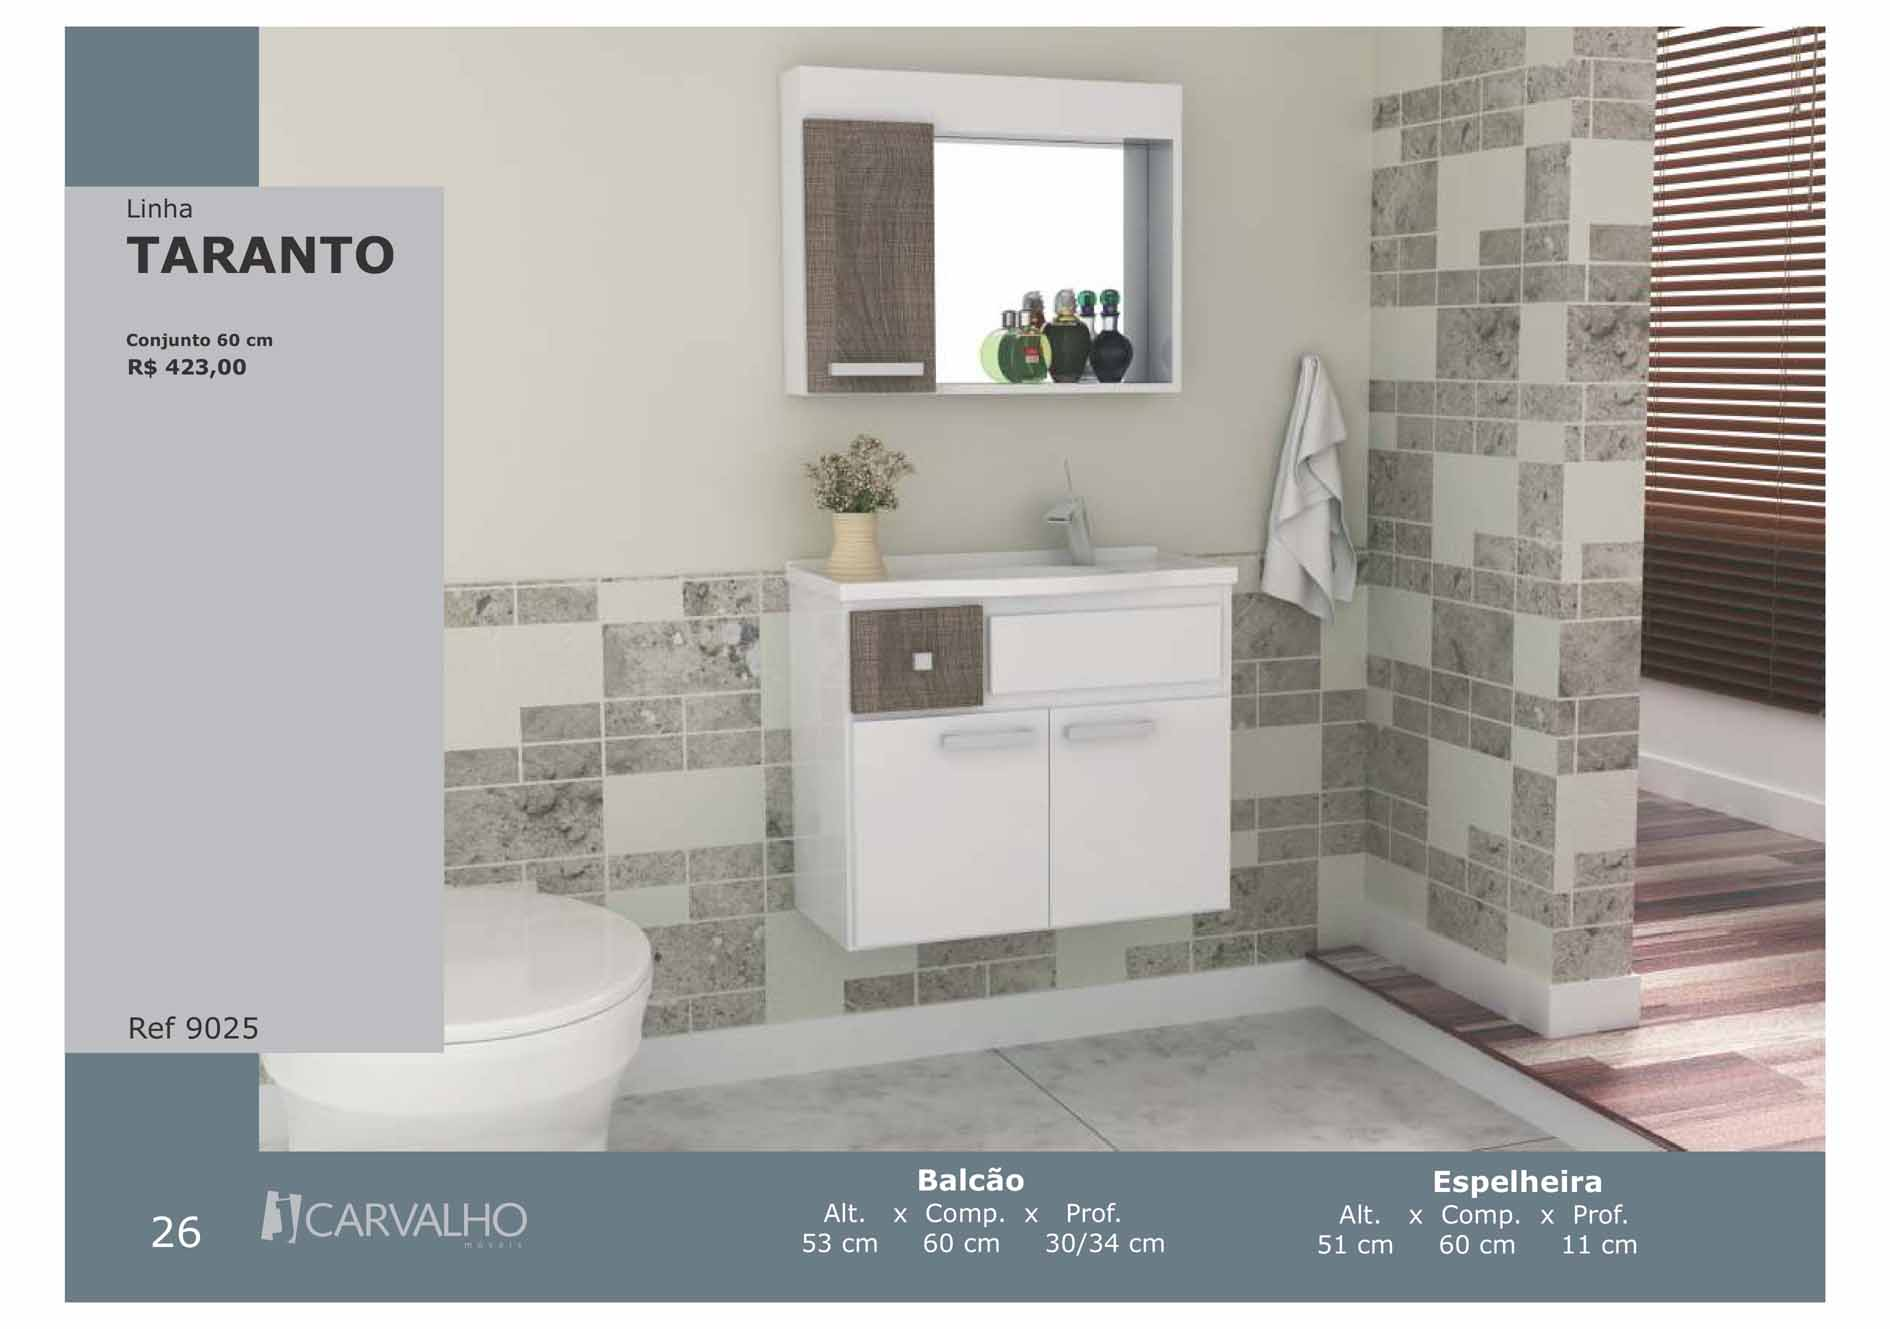 Taranto – Ref 9025